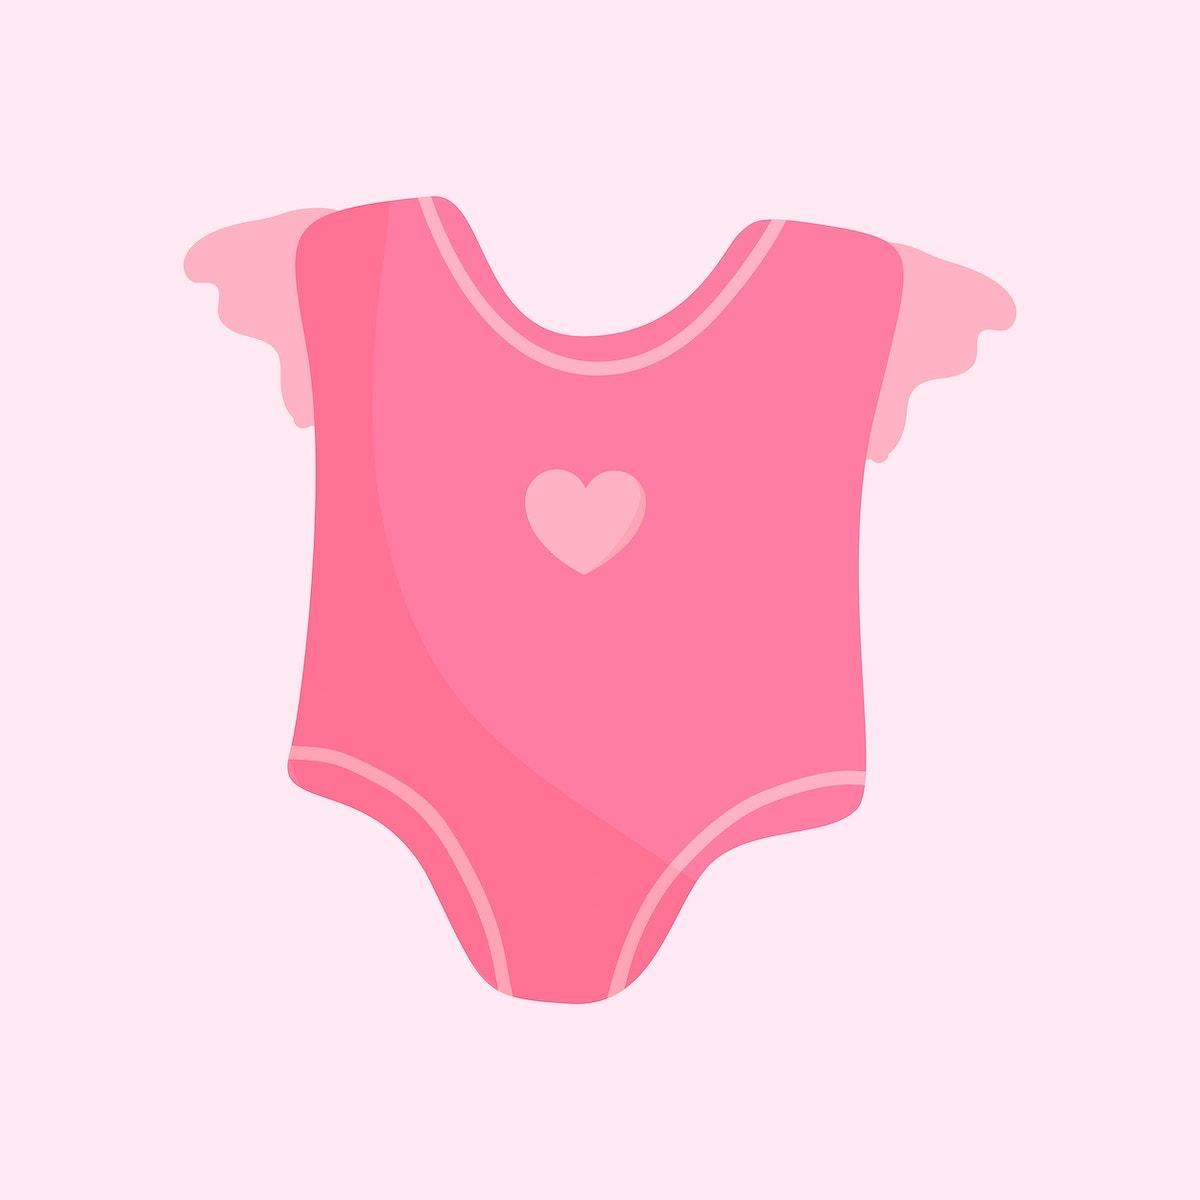 Cute pink baby romper vector